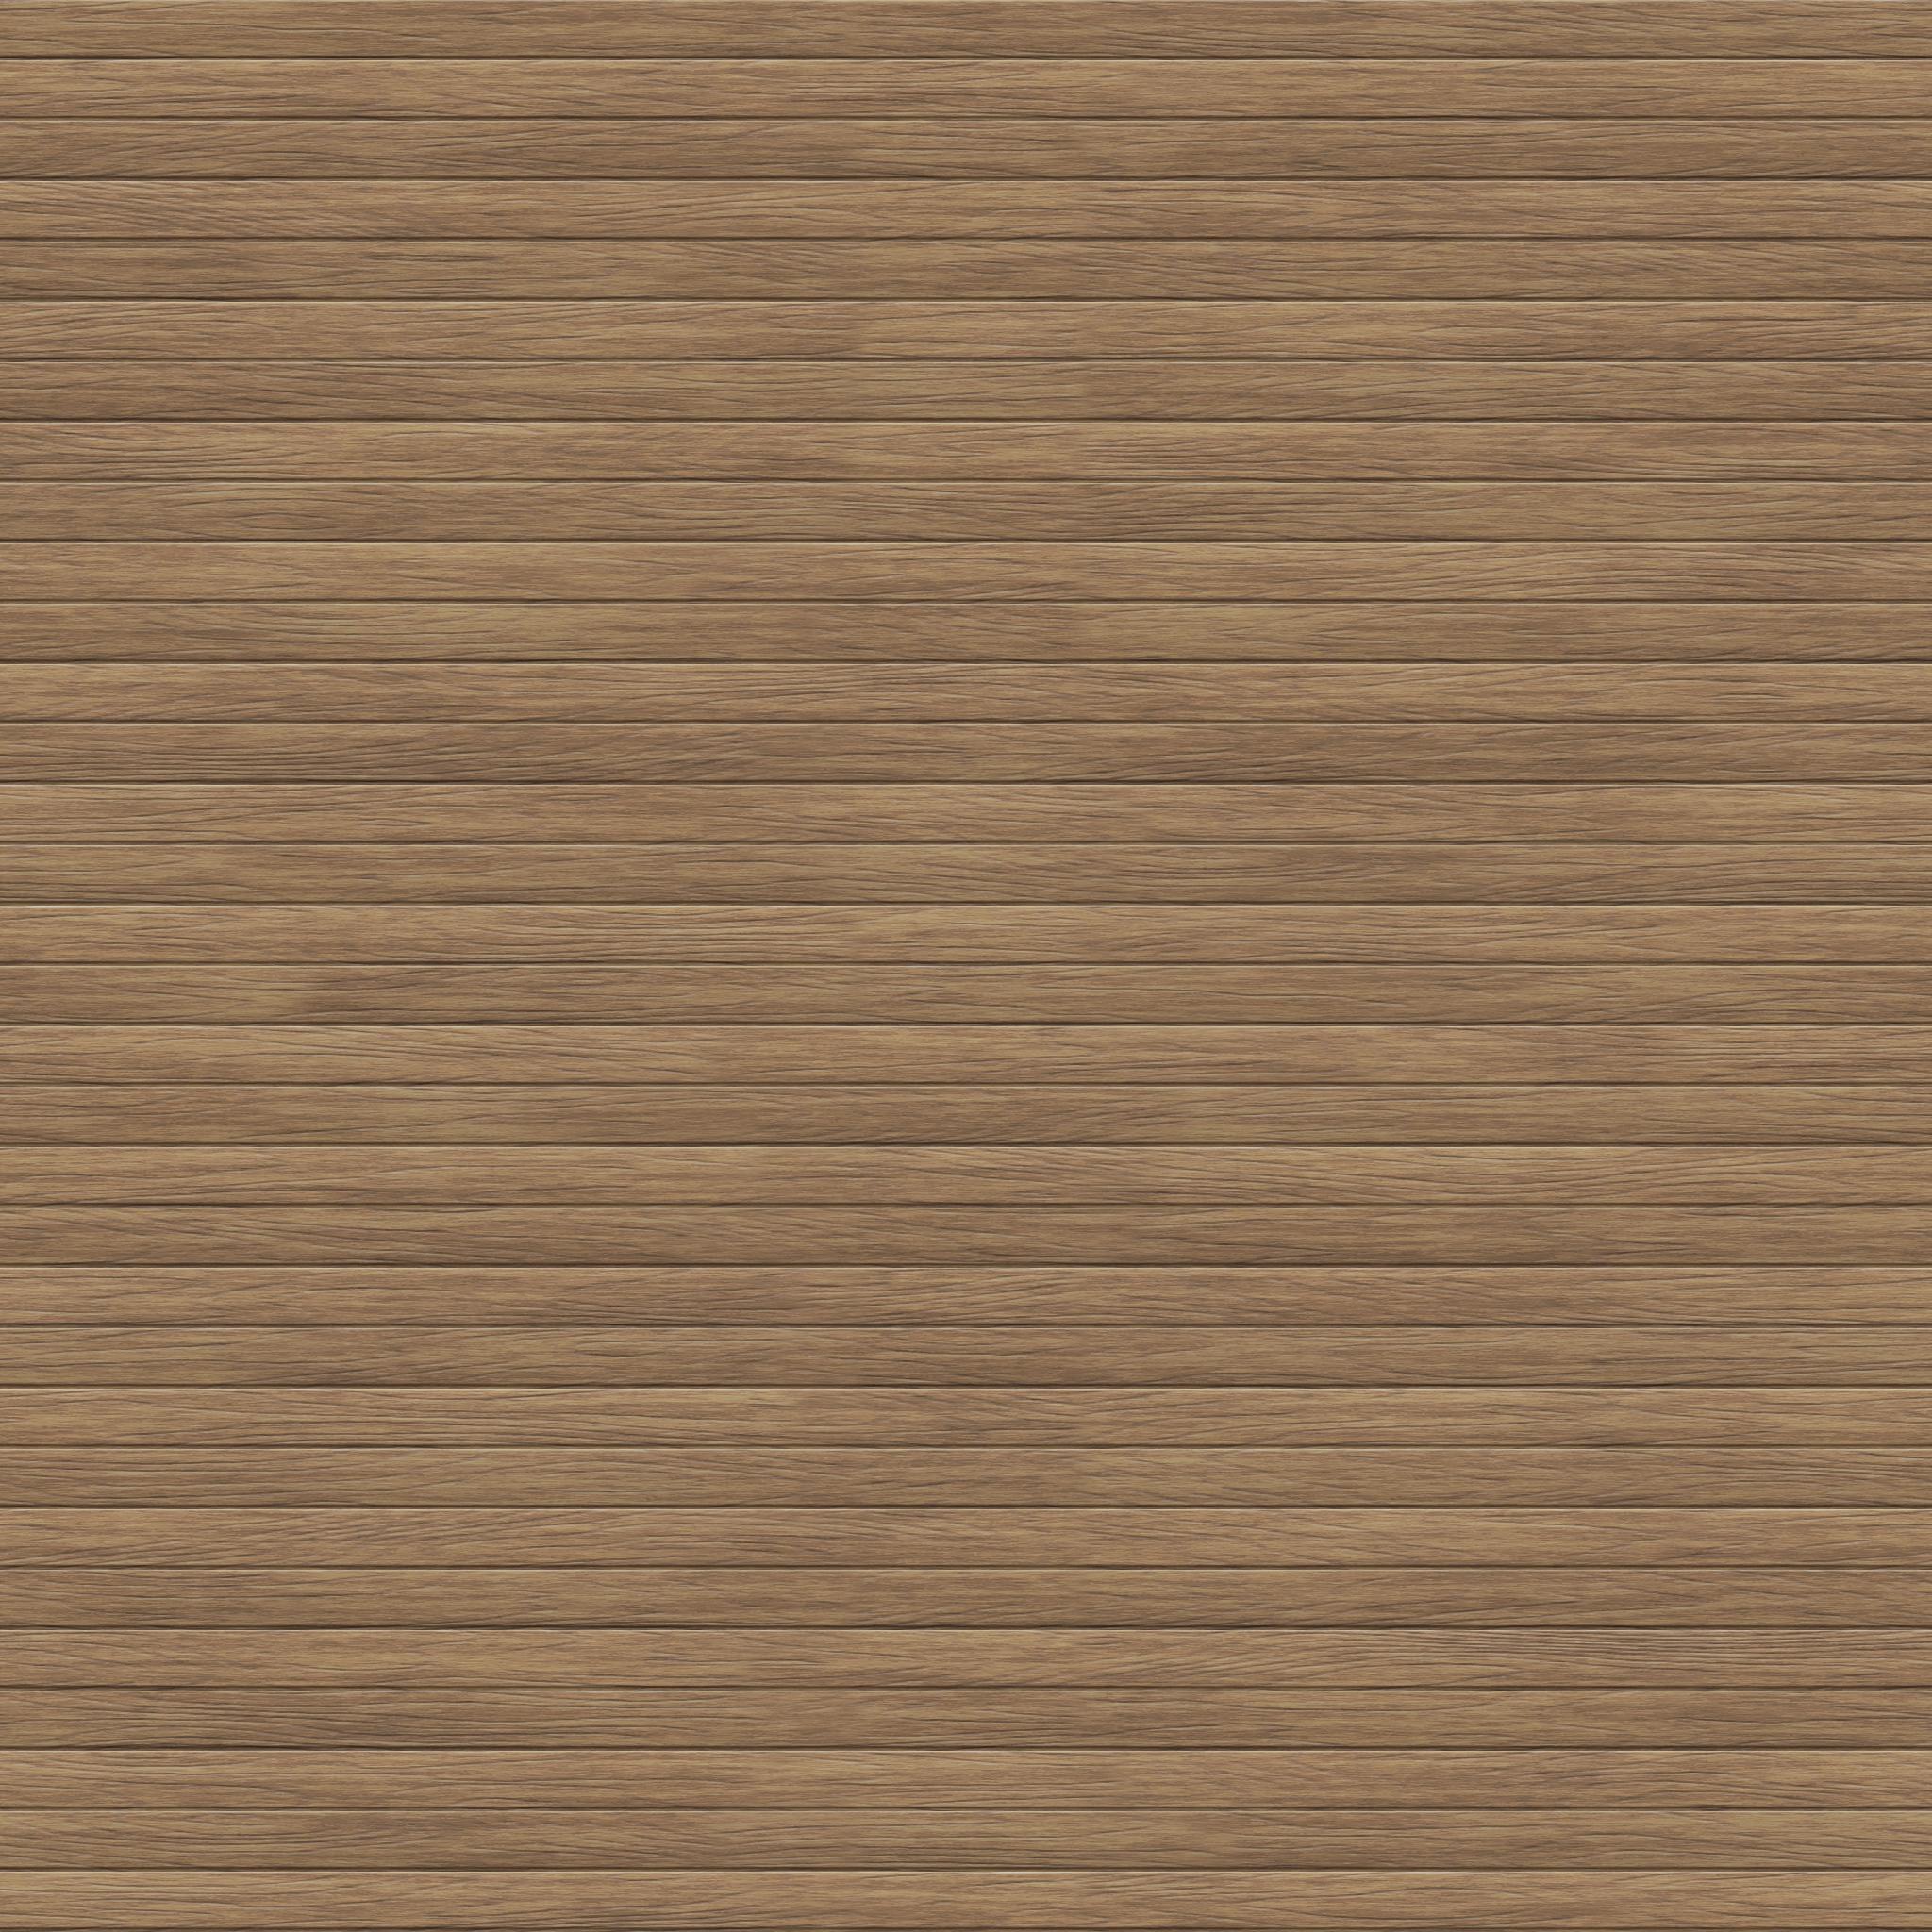 Wooden Planks Texture [Tileable   2048x2048]